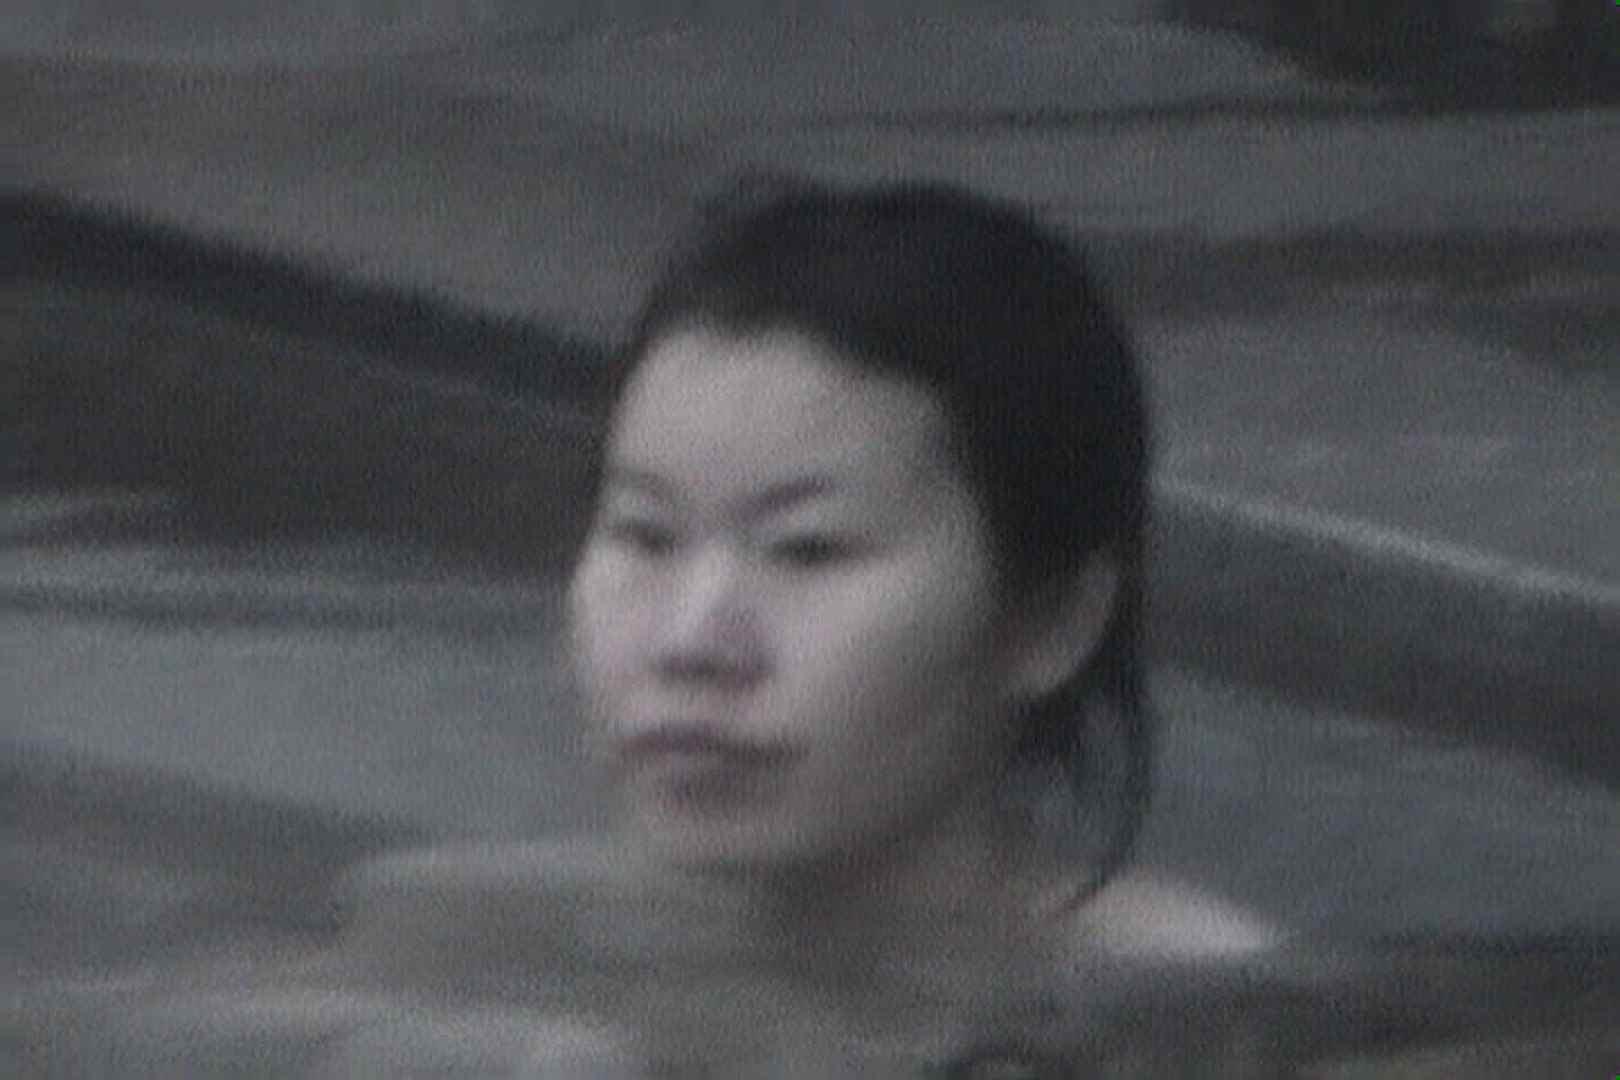 Aquaな露天風呂Vol.556 露天風呂編 | 盗撮シリーズ  99PIX 7